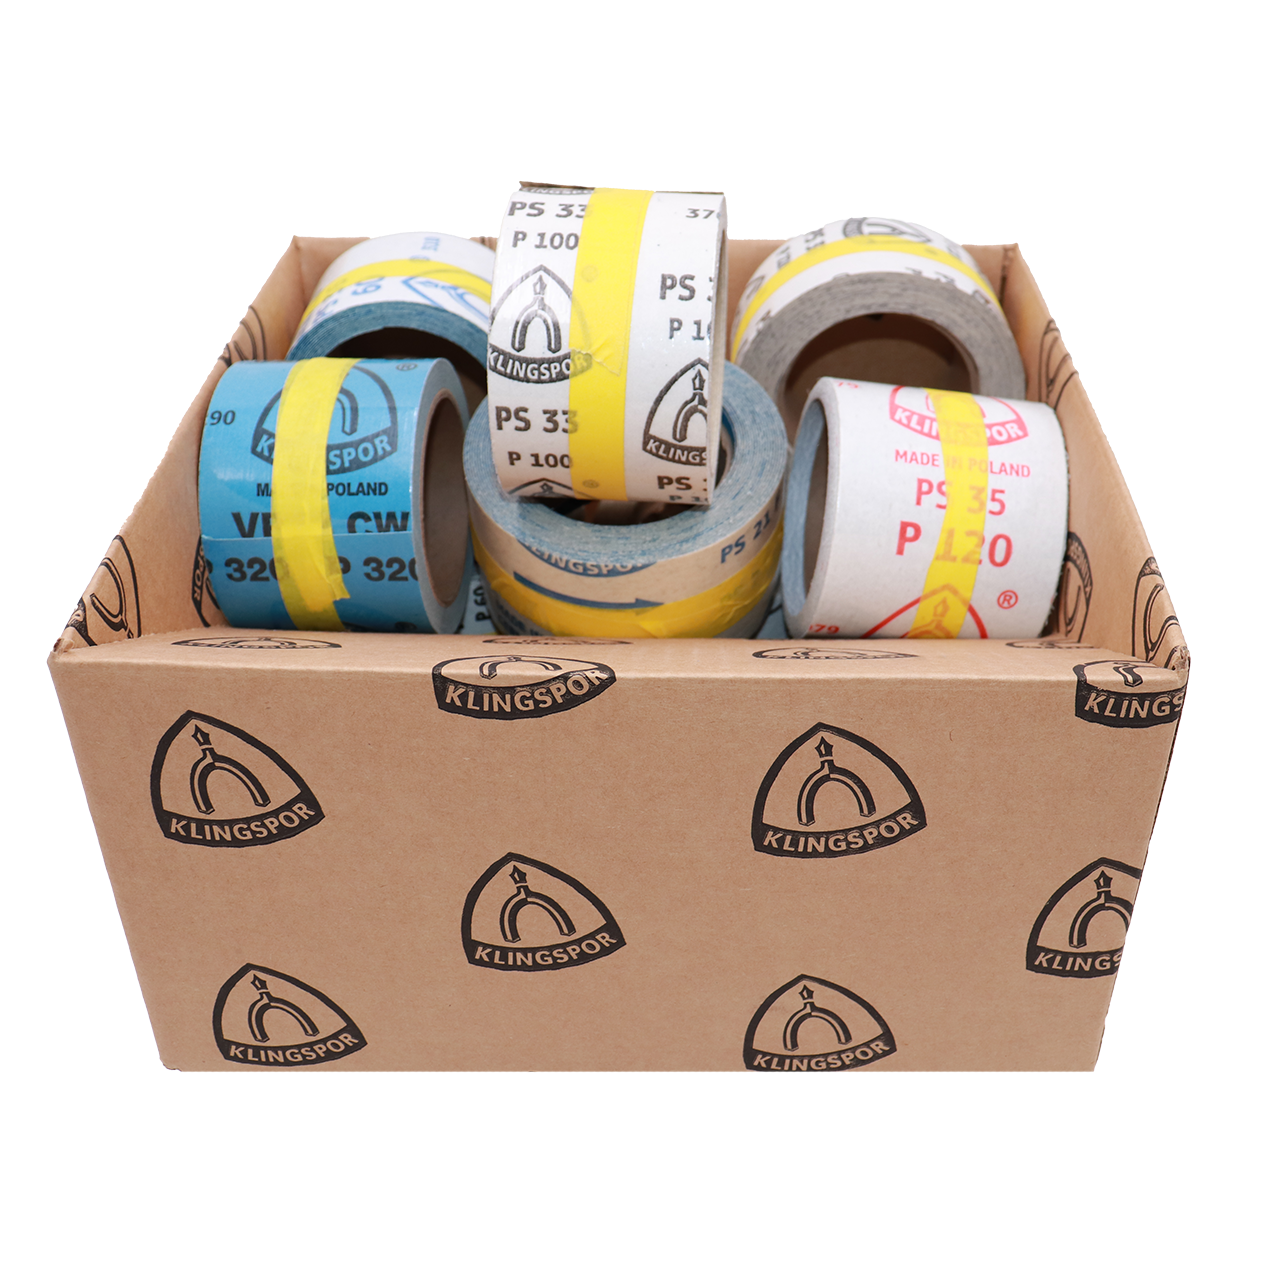 Klingspor Abrasives Bargain Box of Adhesive Rolls - 5 LBS